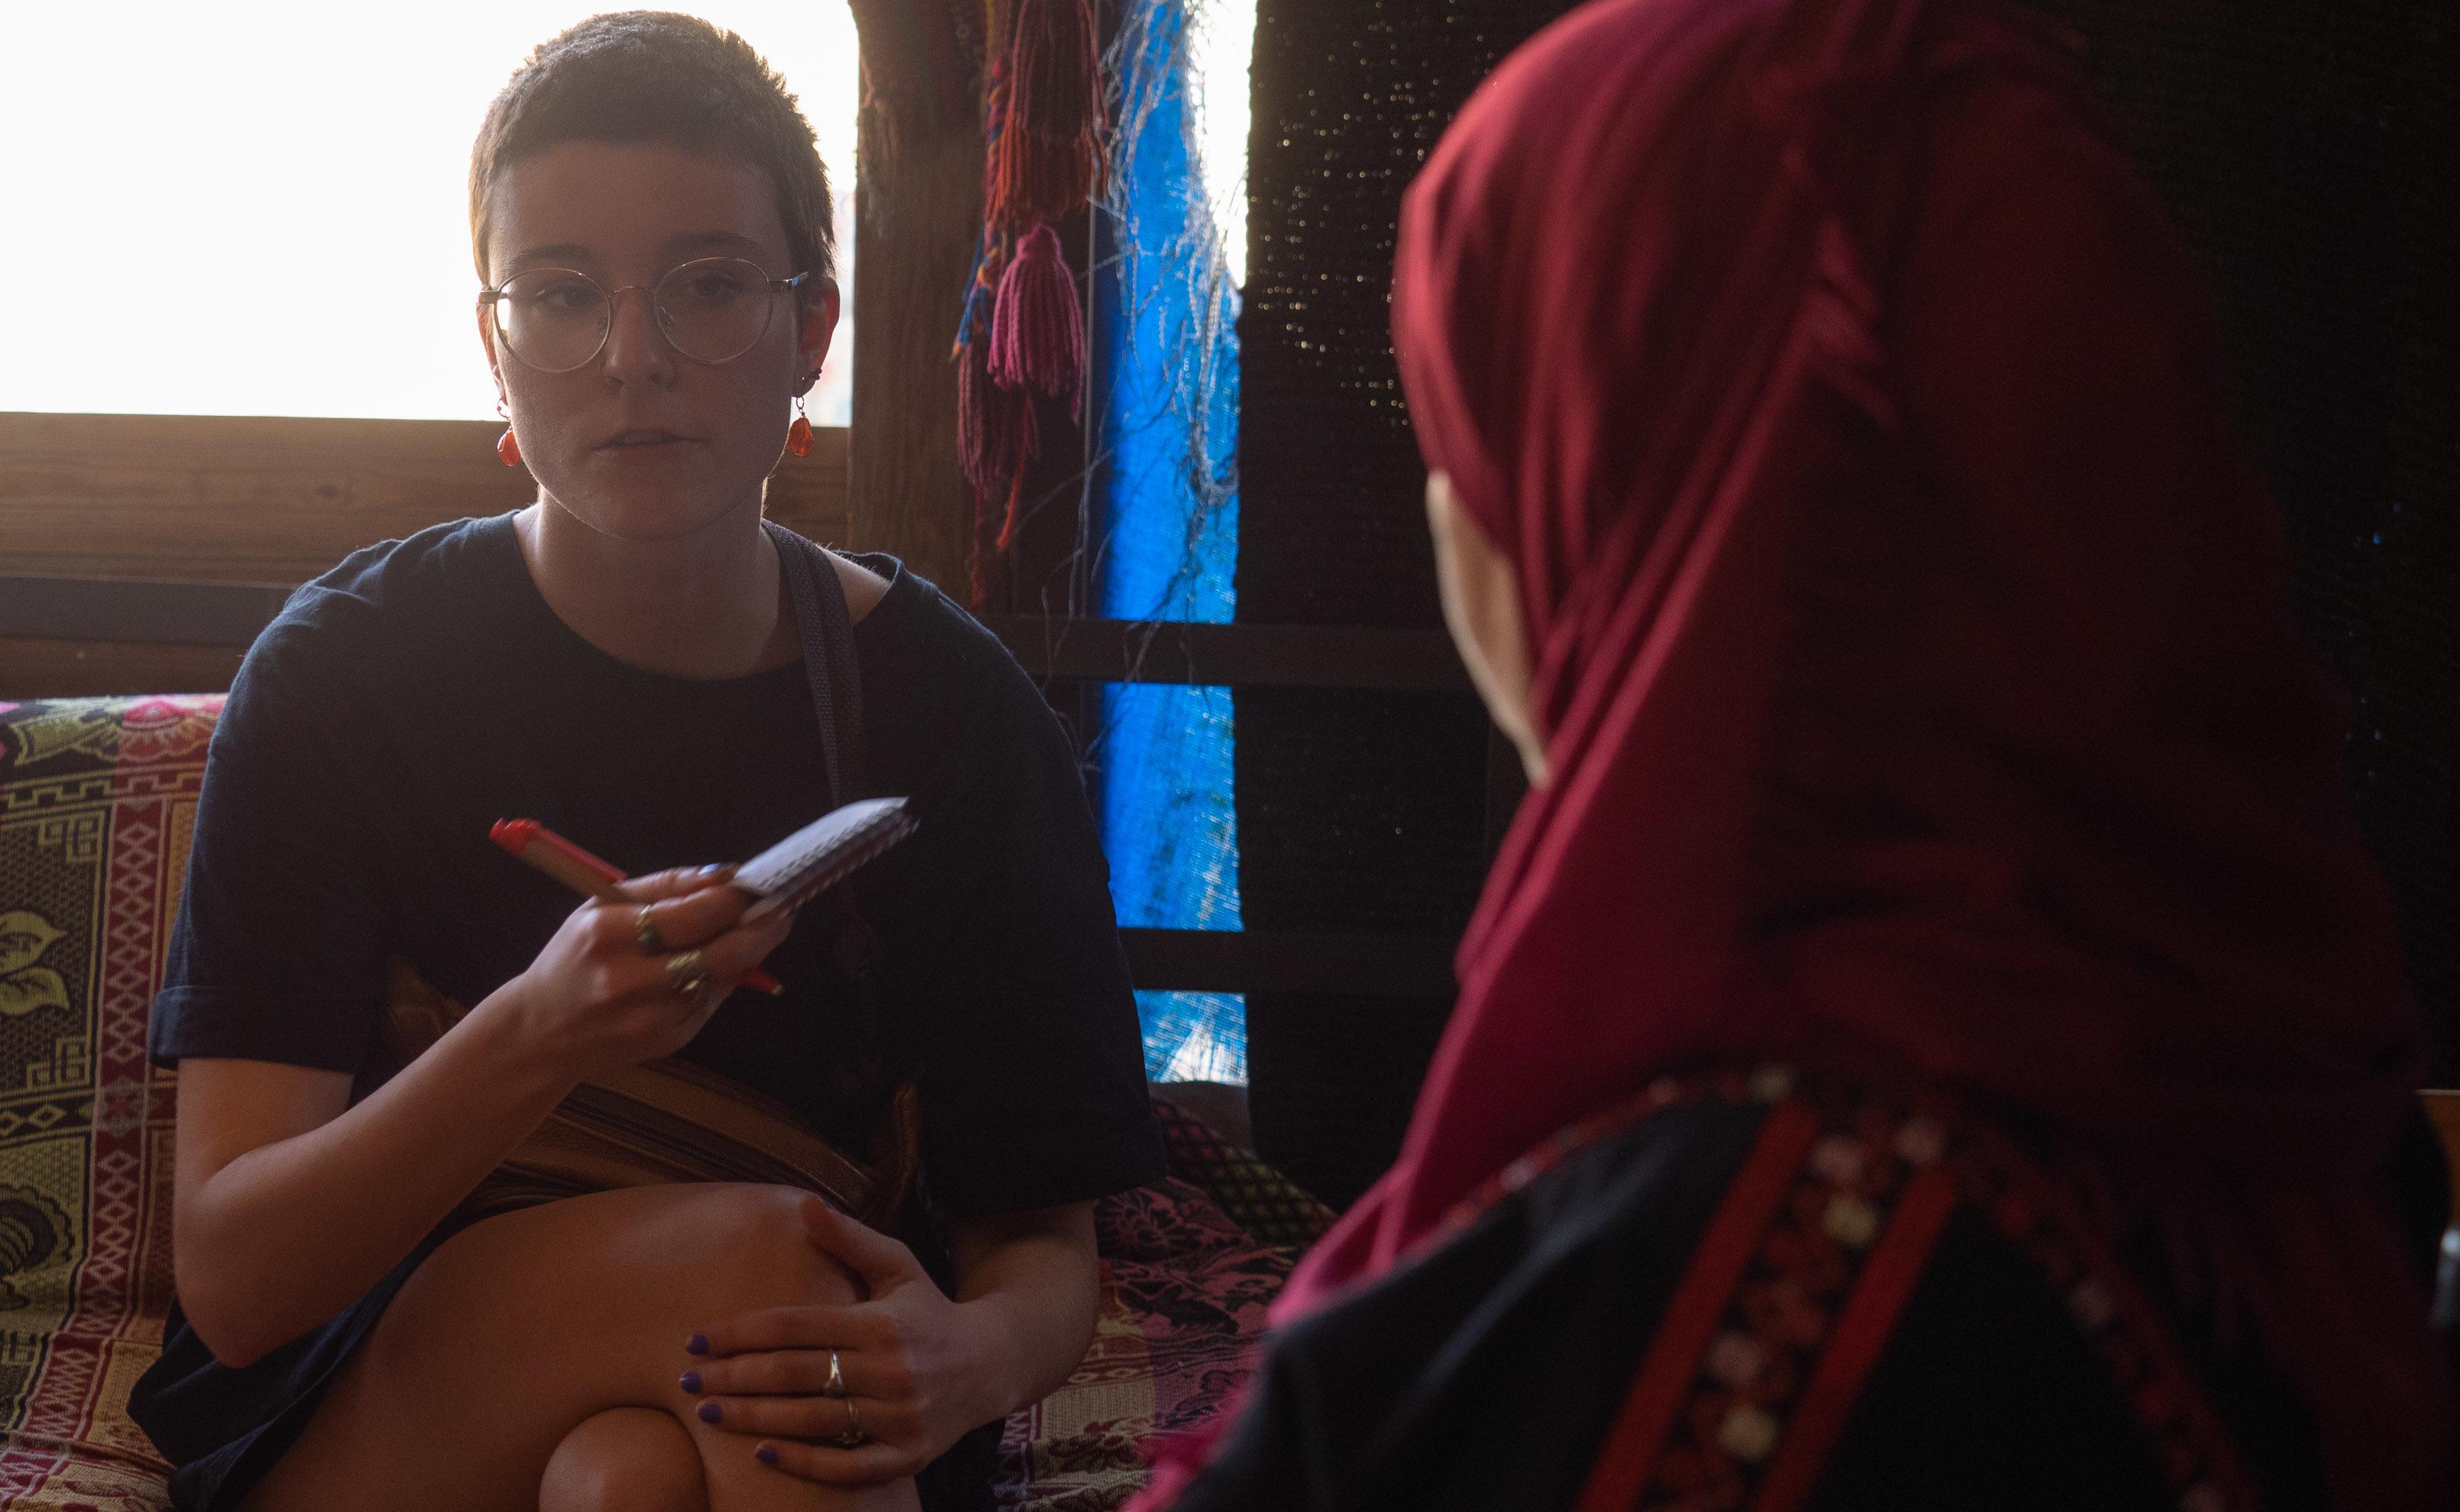 Hanna Hörnlein talks with Suheila about feminism